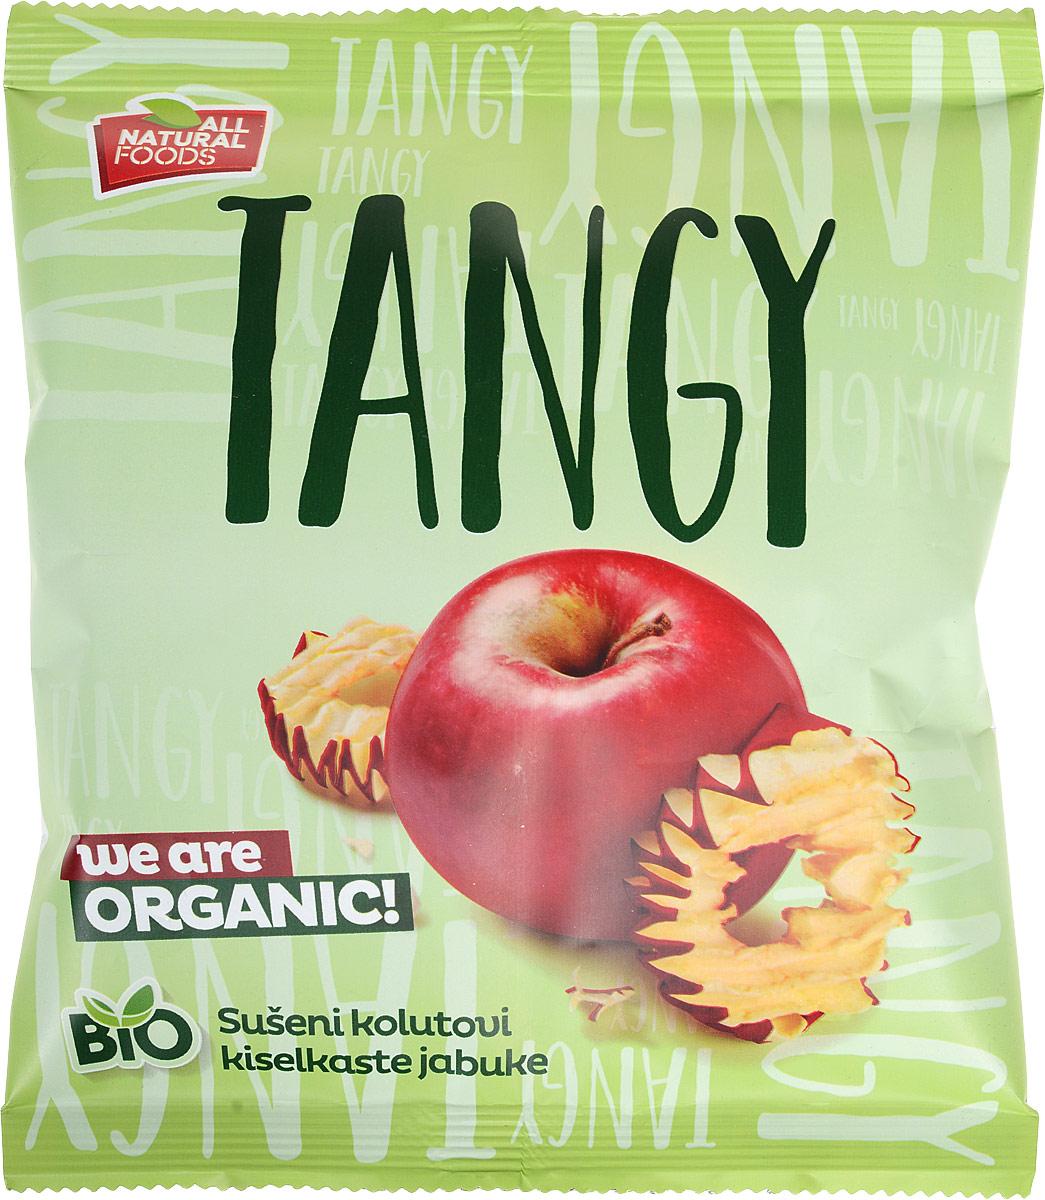 All Natural Foods сушеные колечки яблок кислый сорт, 20 г richards natural computation paper